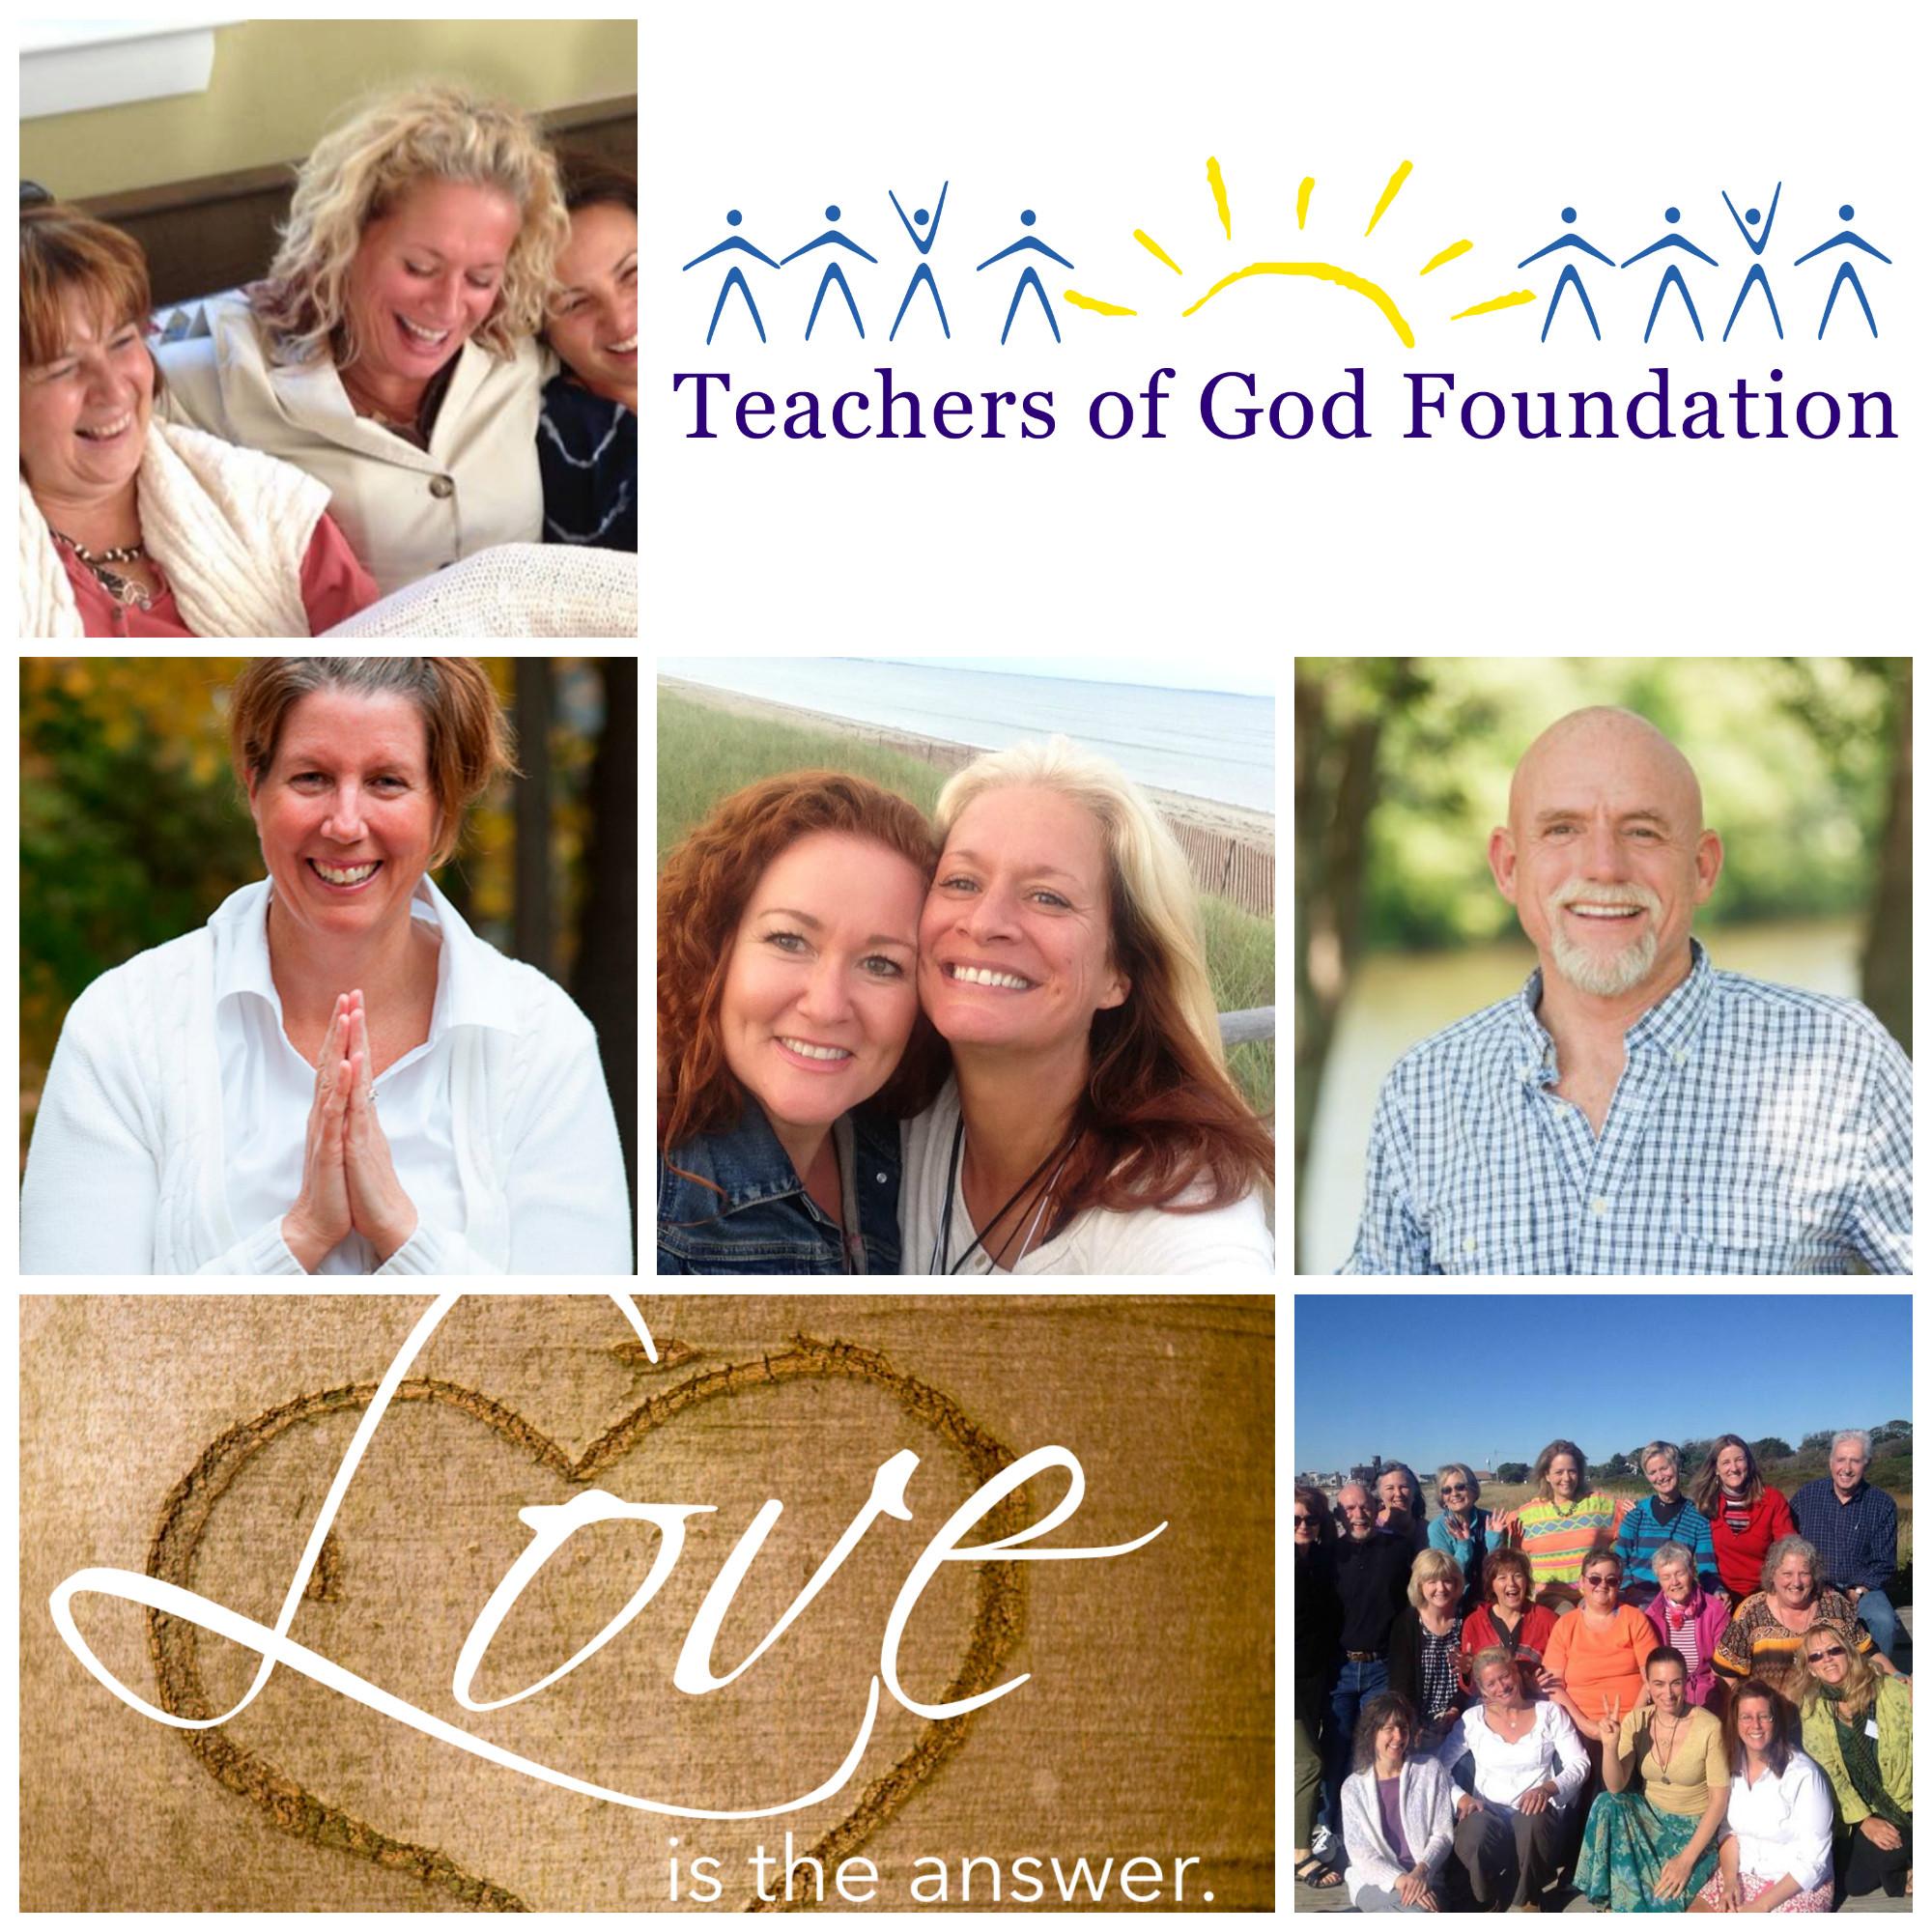 Teachers of God Foundation